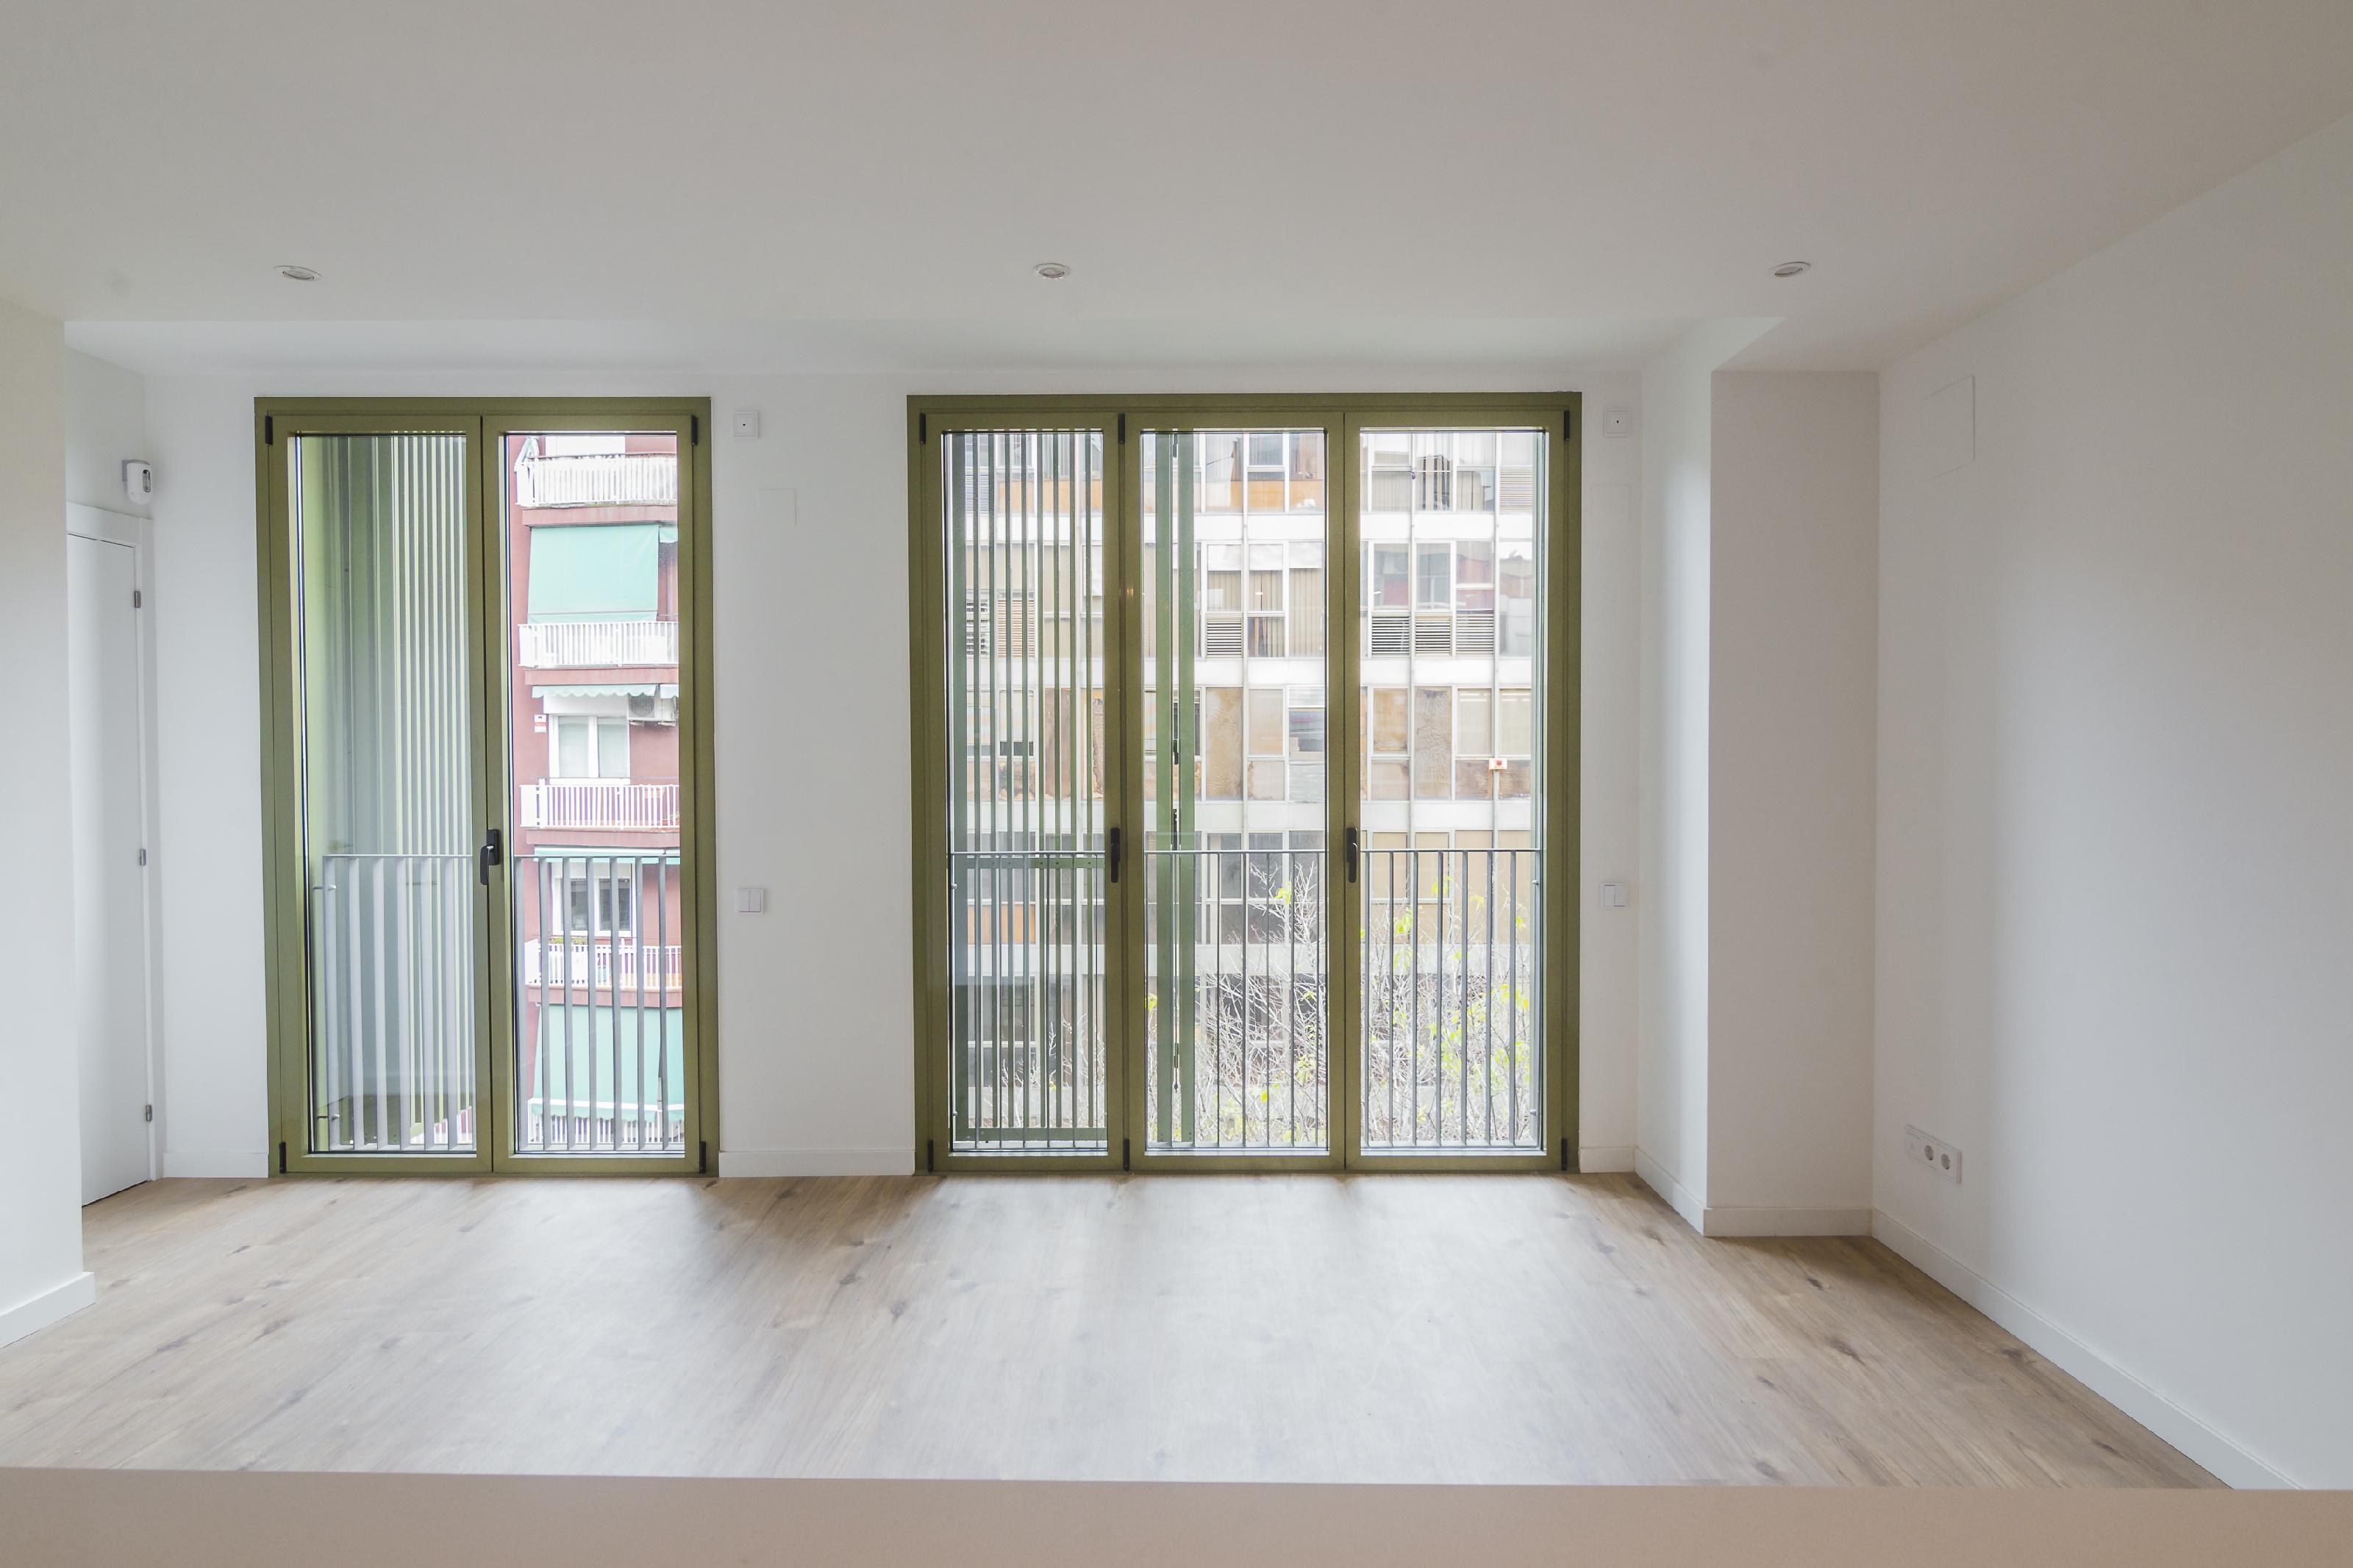 249860 Flat for sale in Eixample, Nova Esquerra Eixample 11